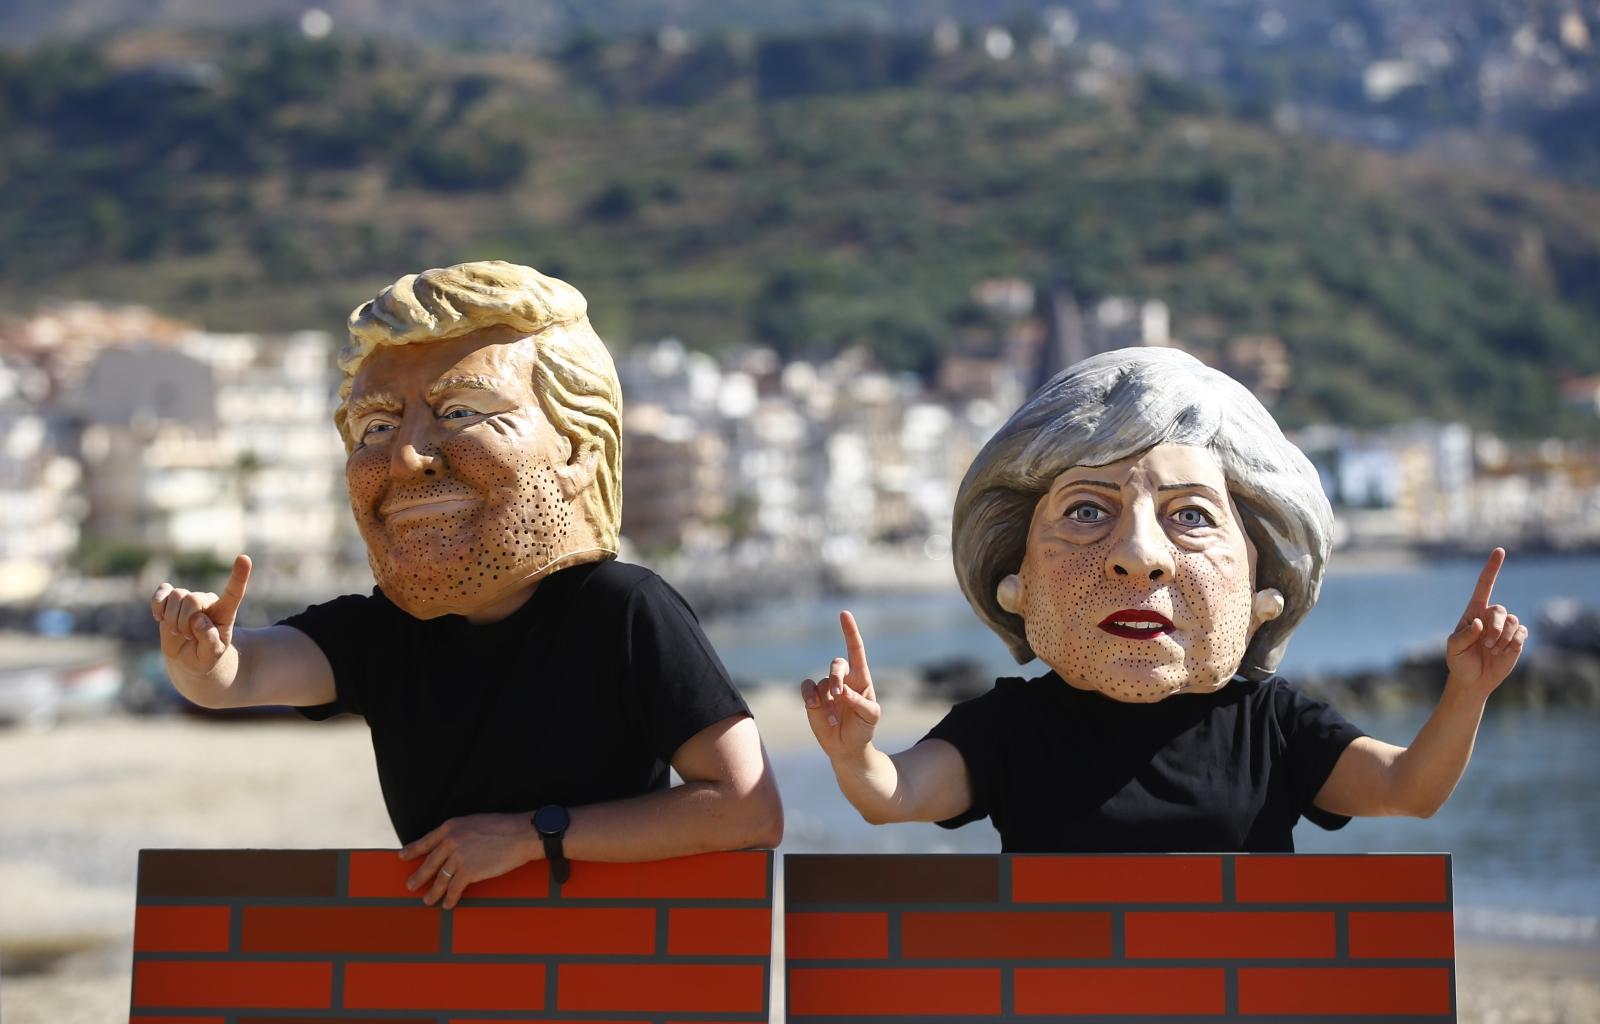 Donald Trump's UK visit